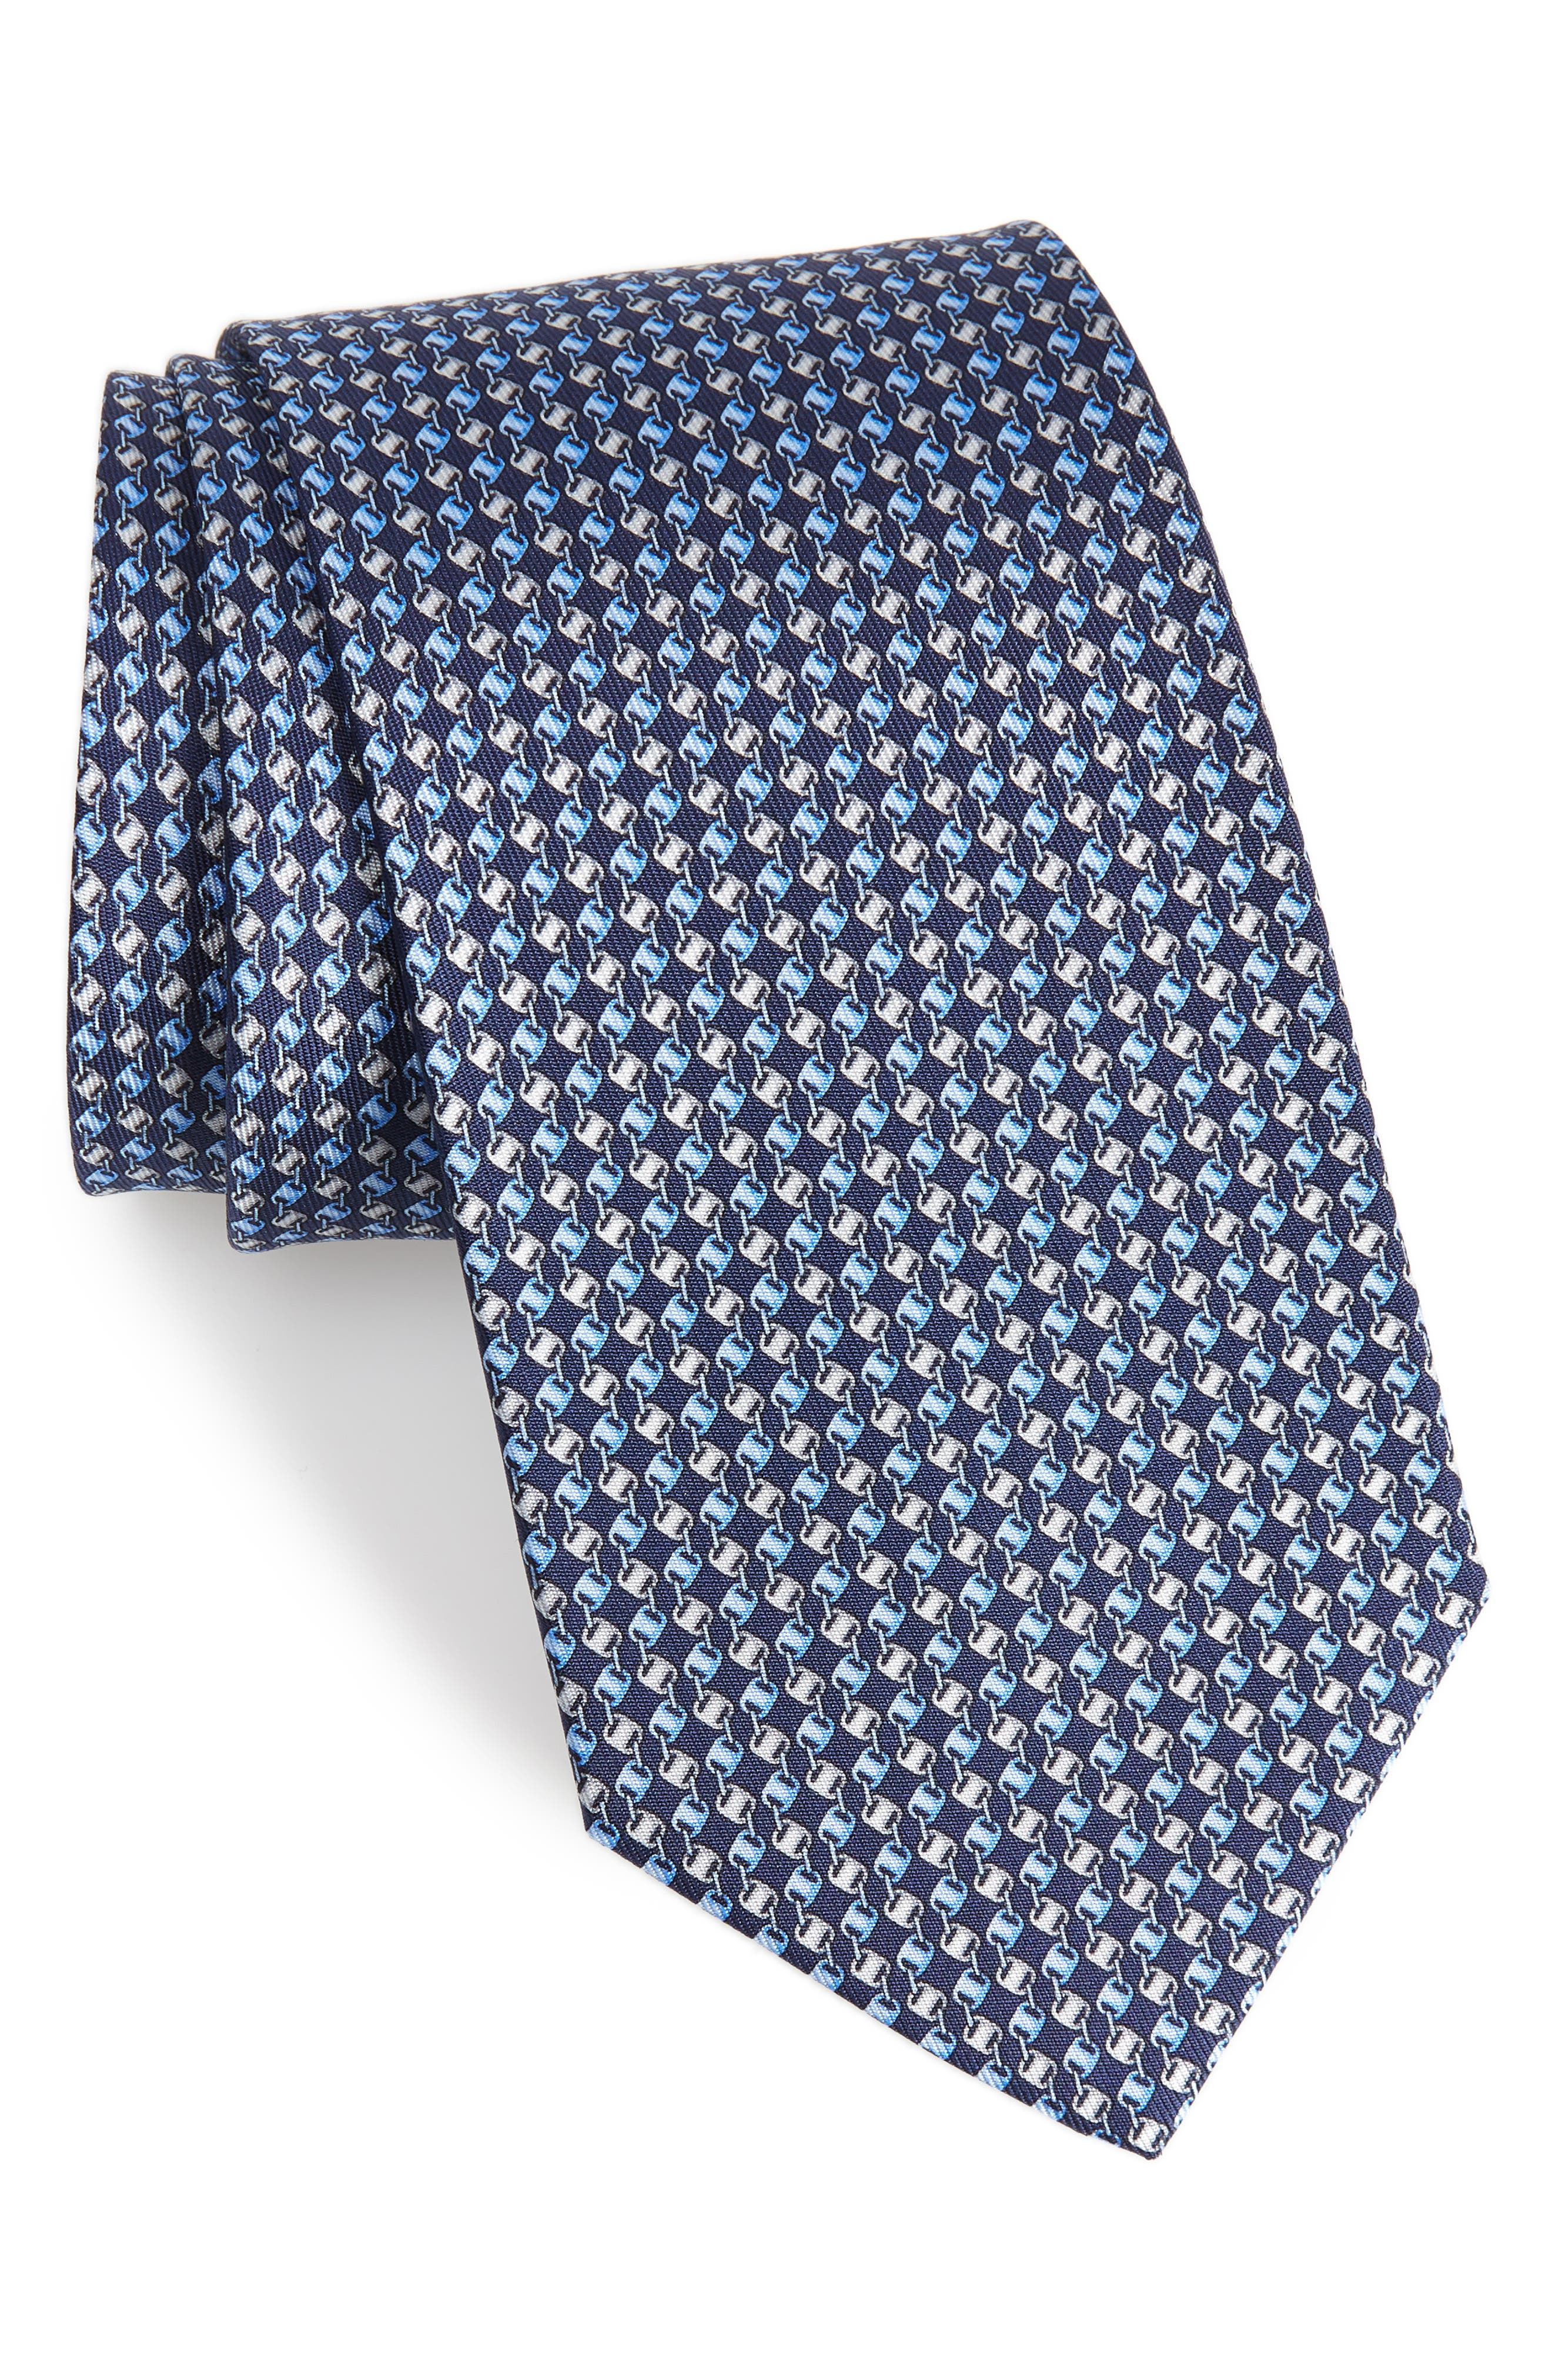 Oara Print Silk Tie,                             Main thumbnail 1, color,                             Navy